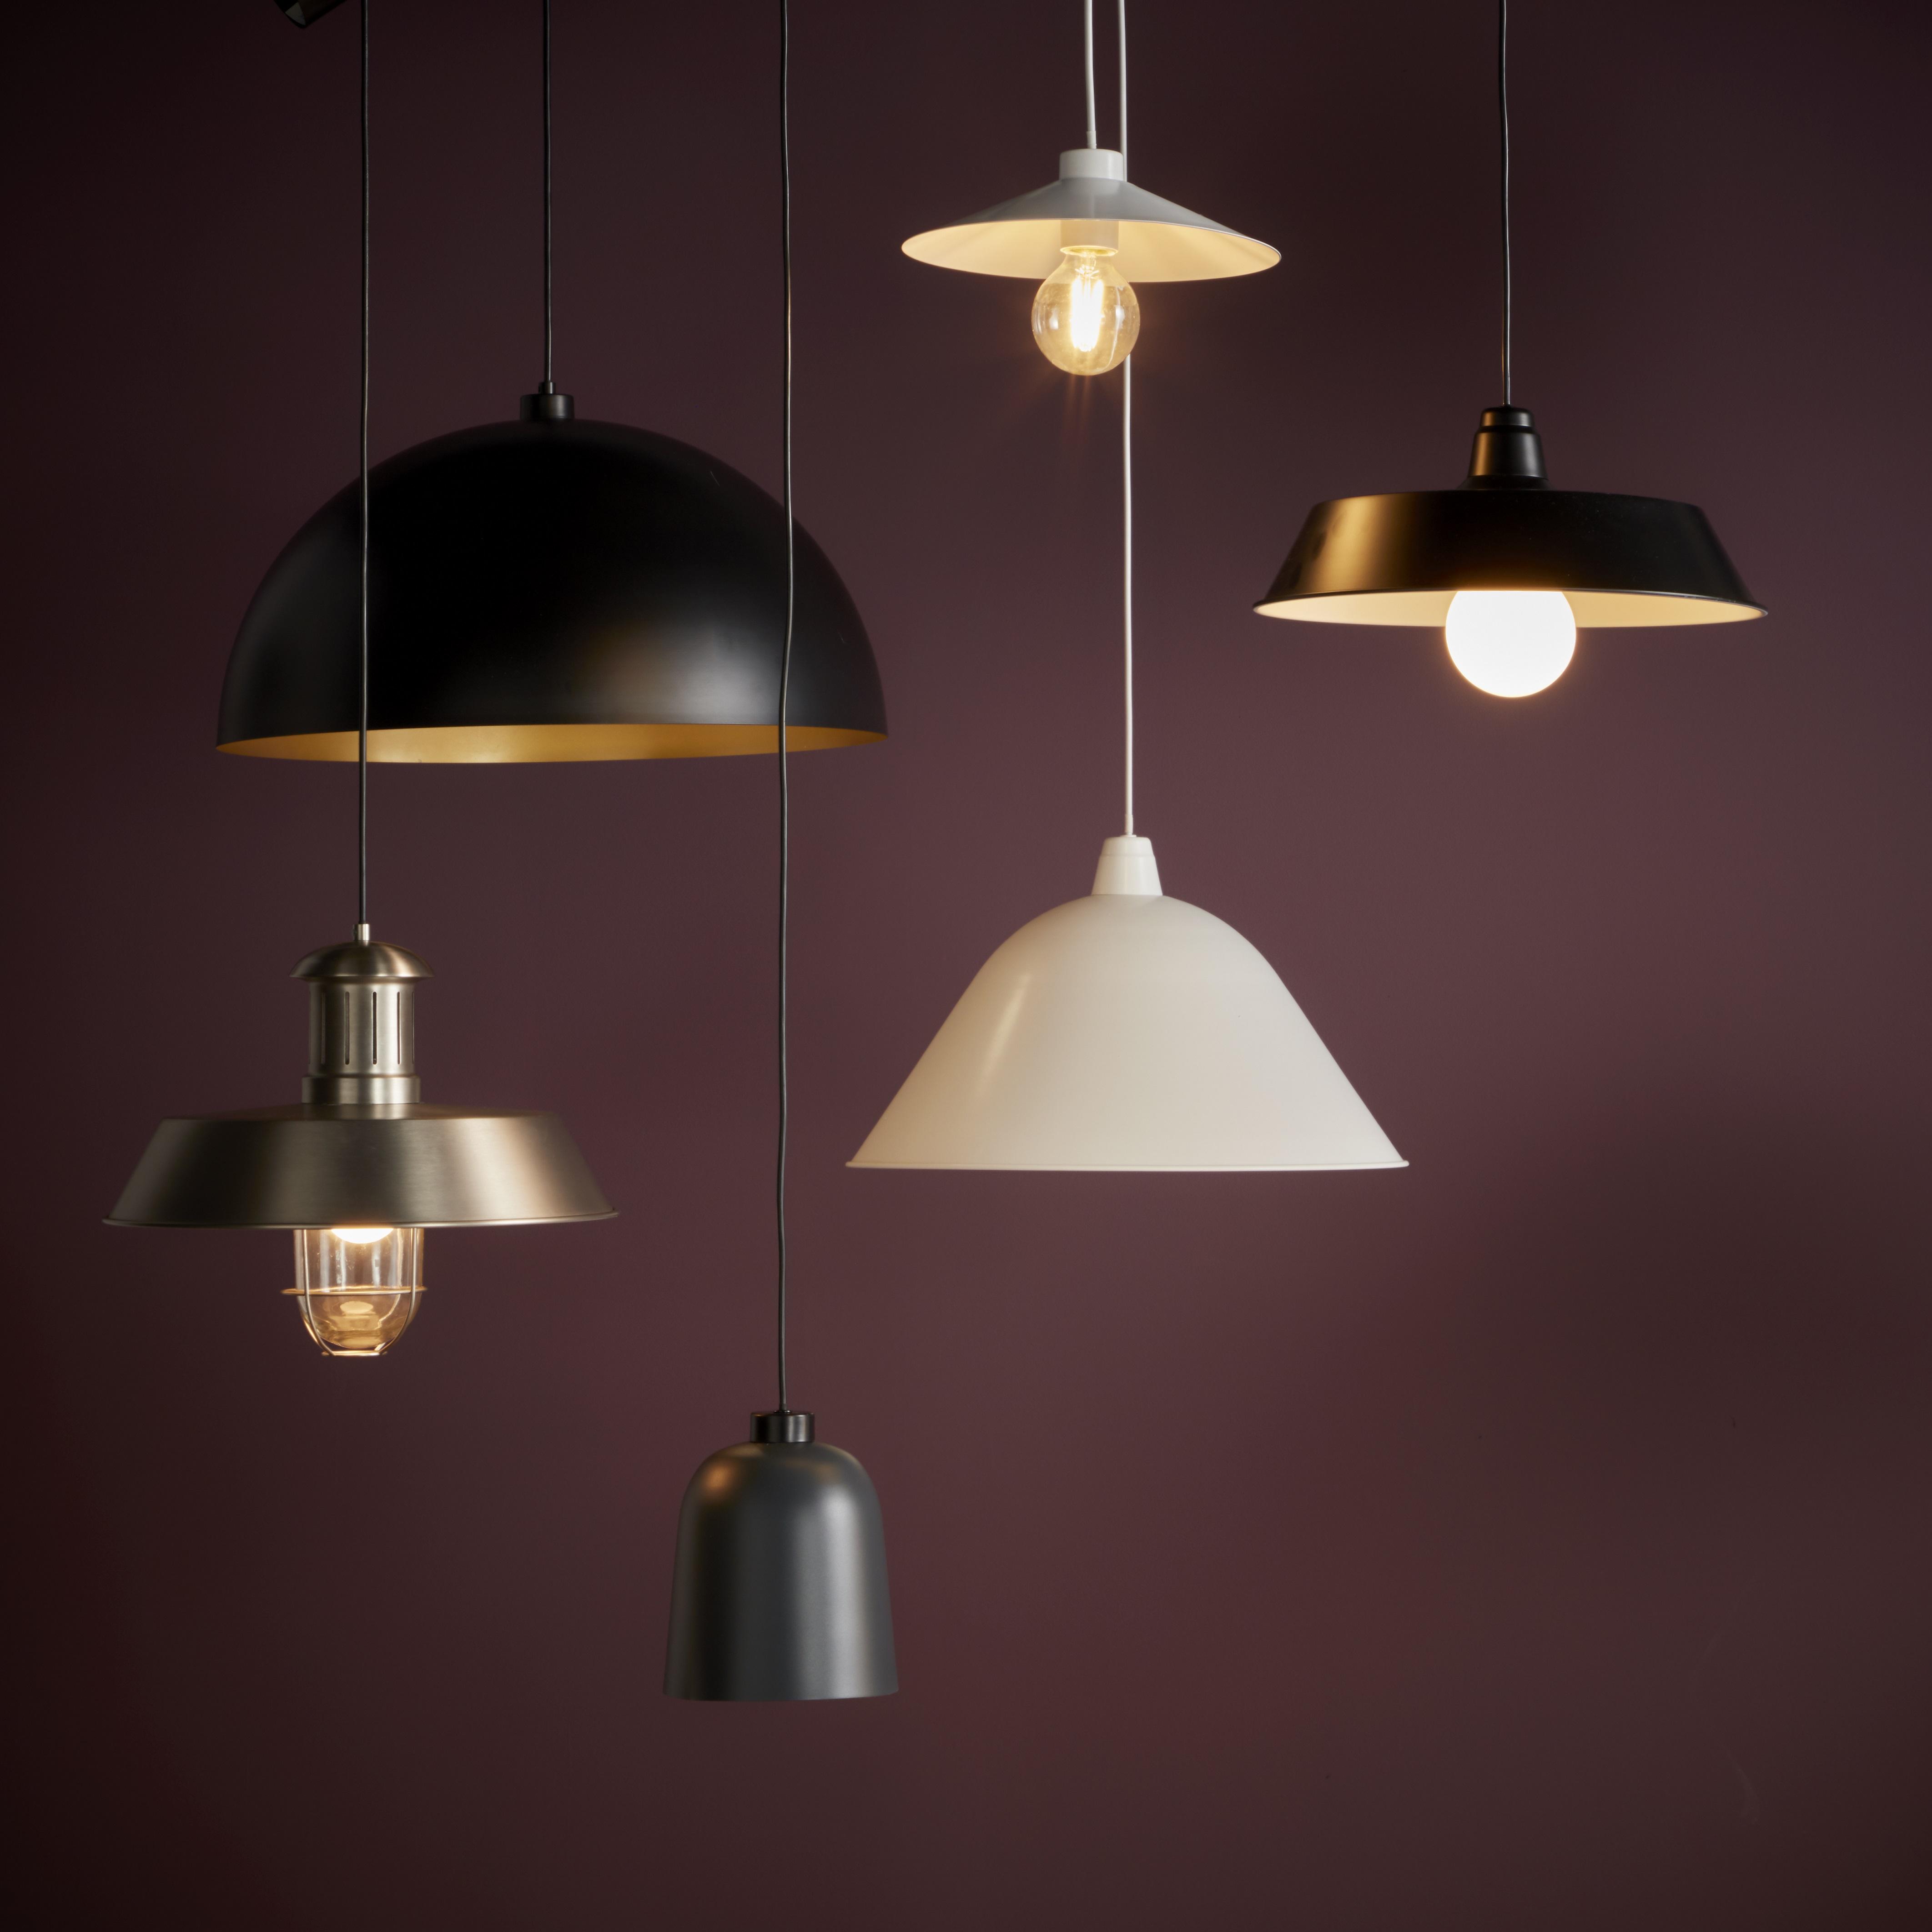 B Q Launches Brand New Lighting Range With Hundreds Of Stylish Designs Construction Supply Magazine